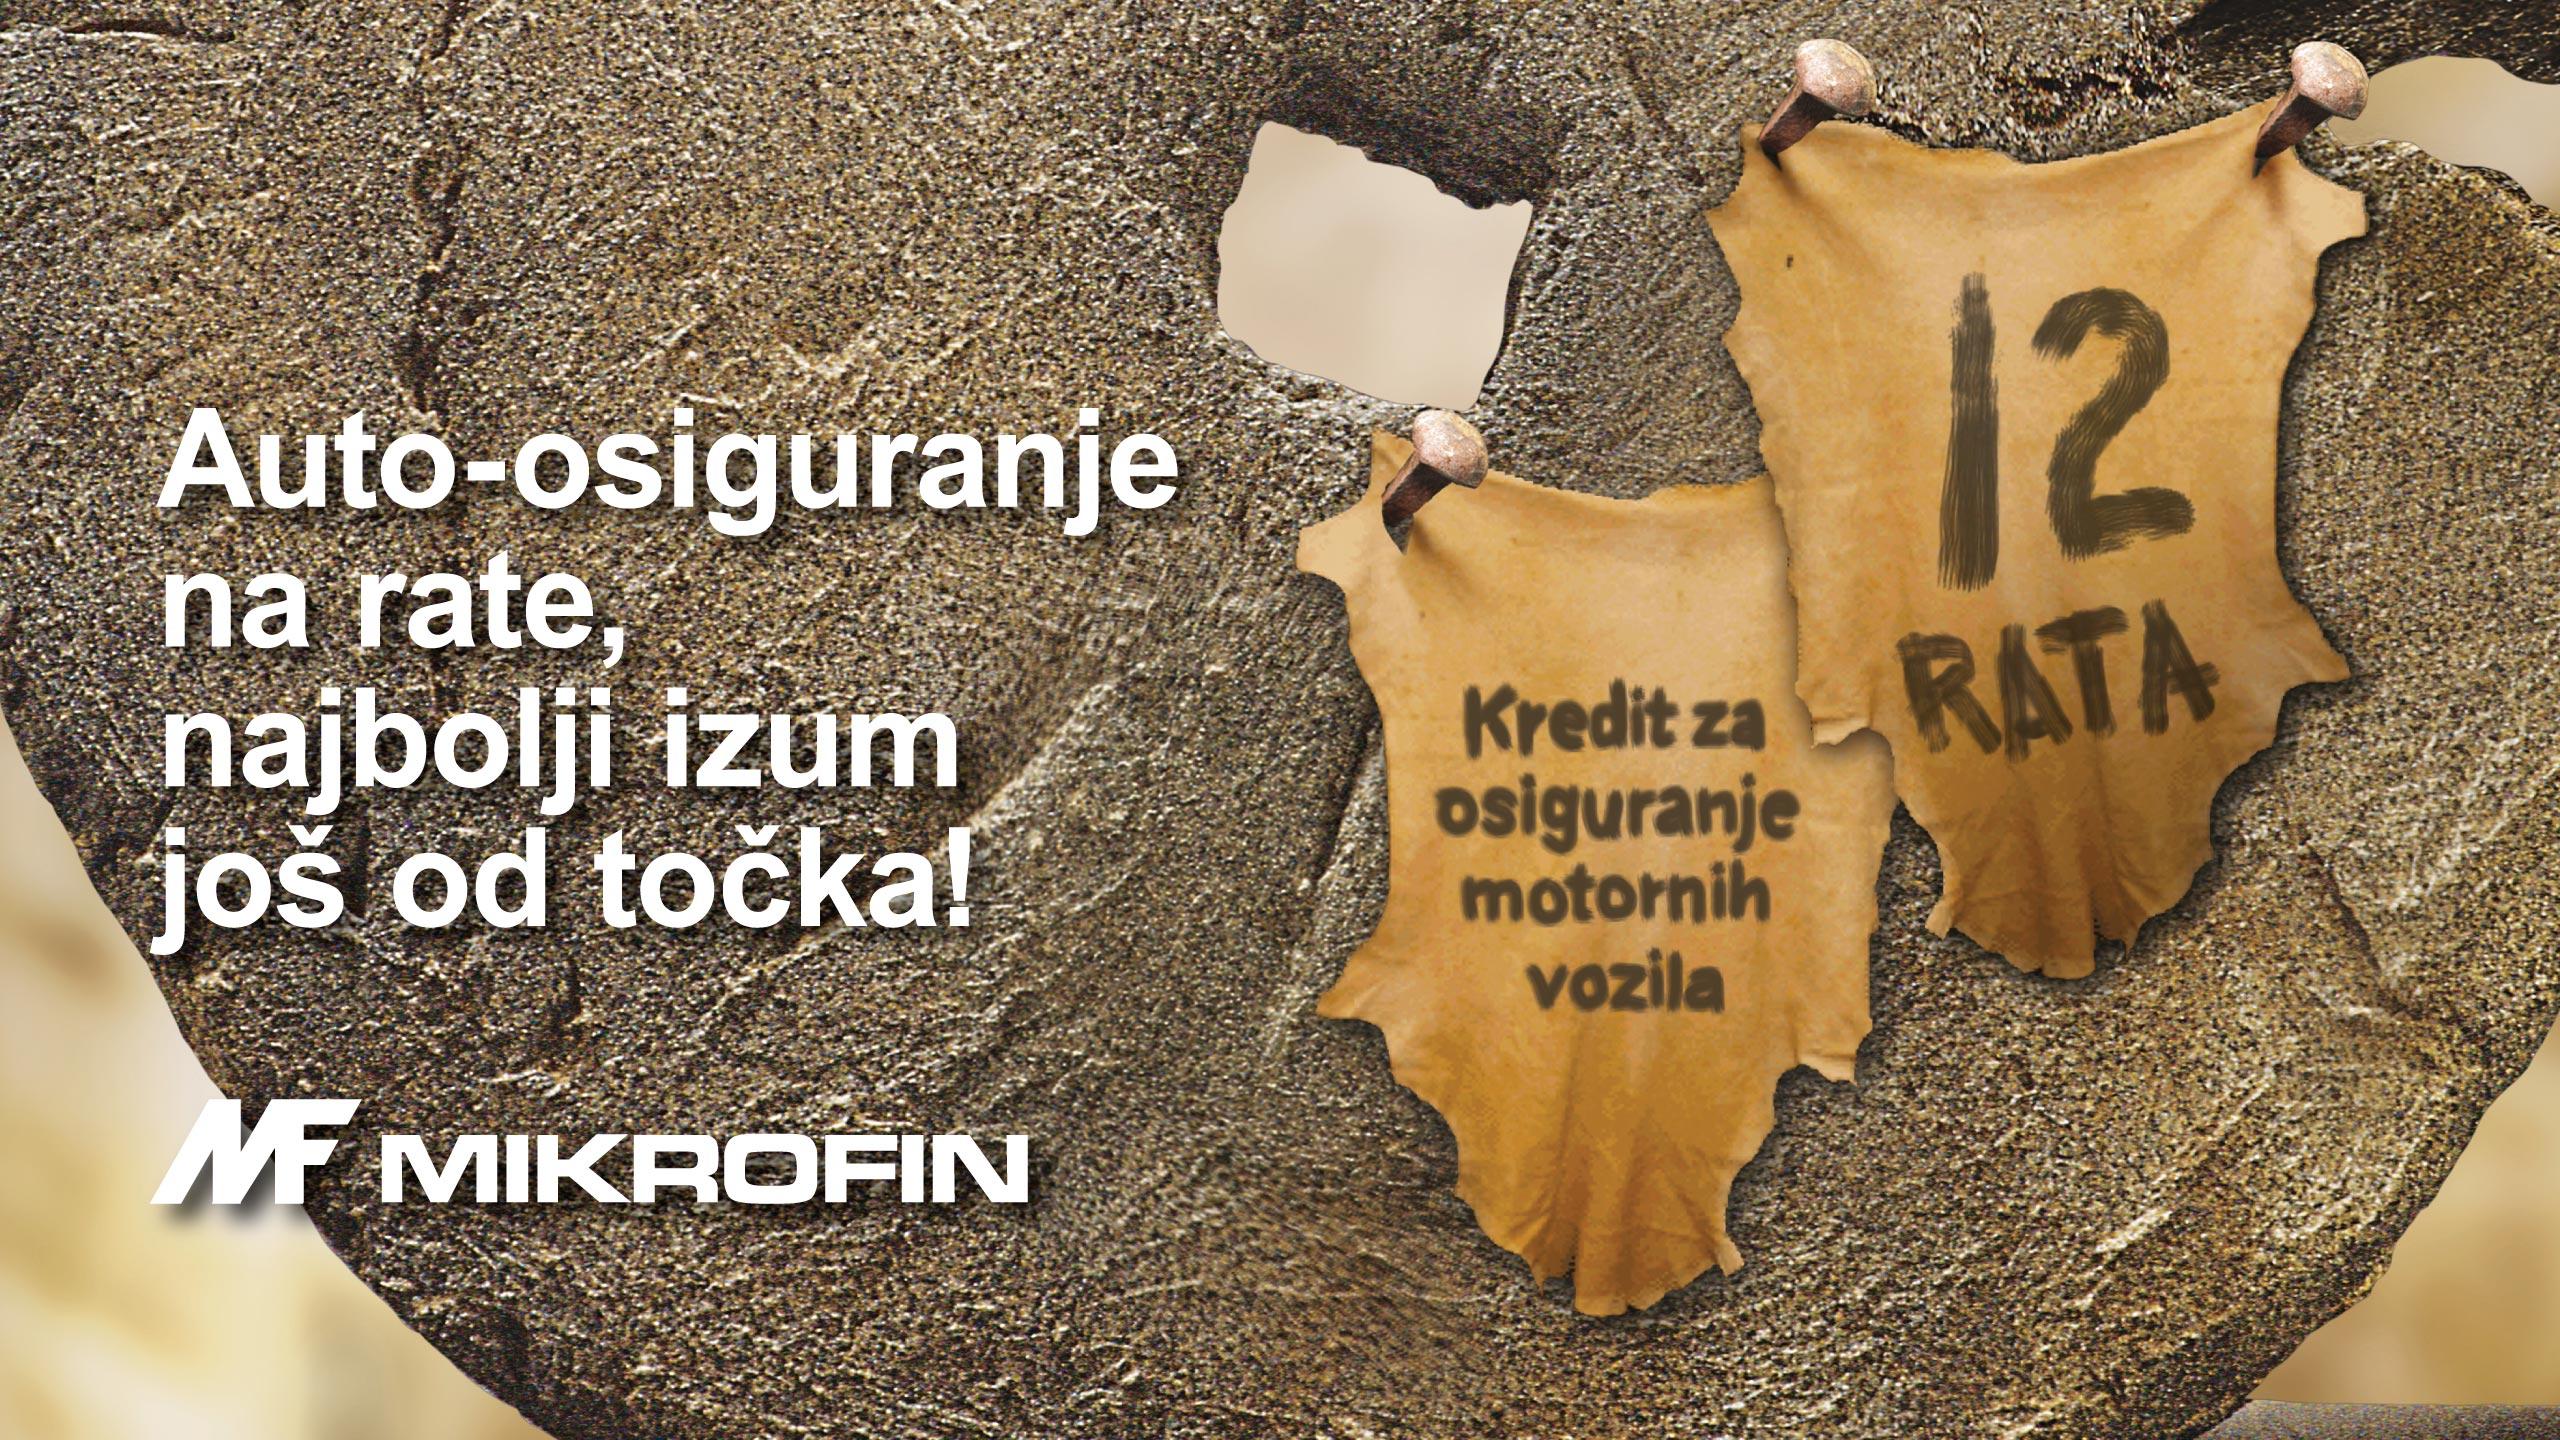 Mikrofin osiguranje  | Agencija AQUARIUS | Banja Luka